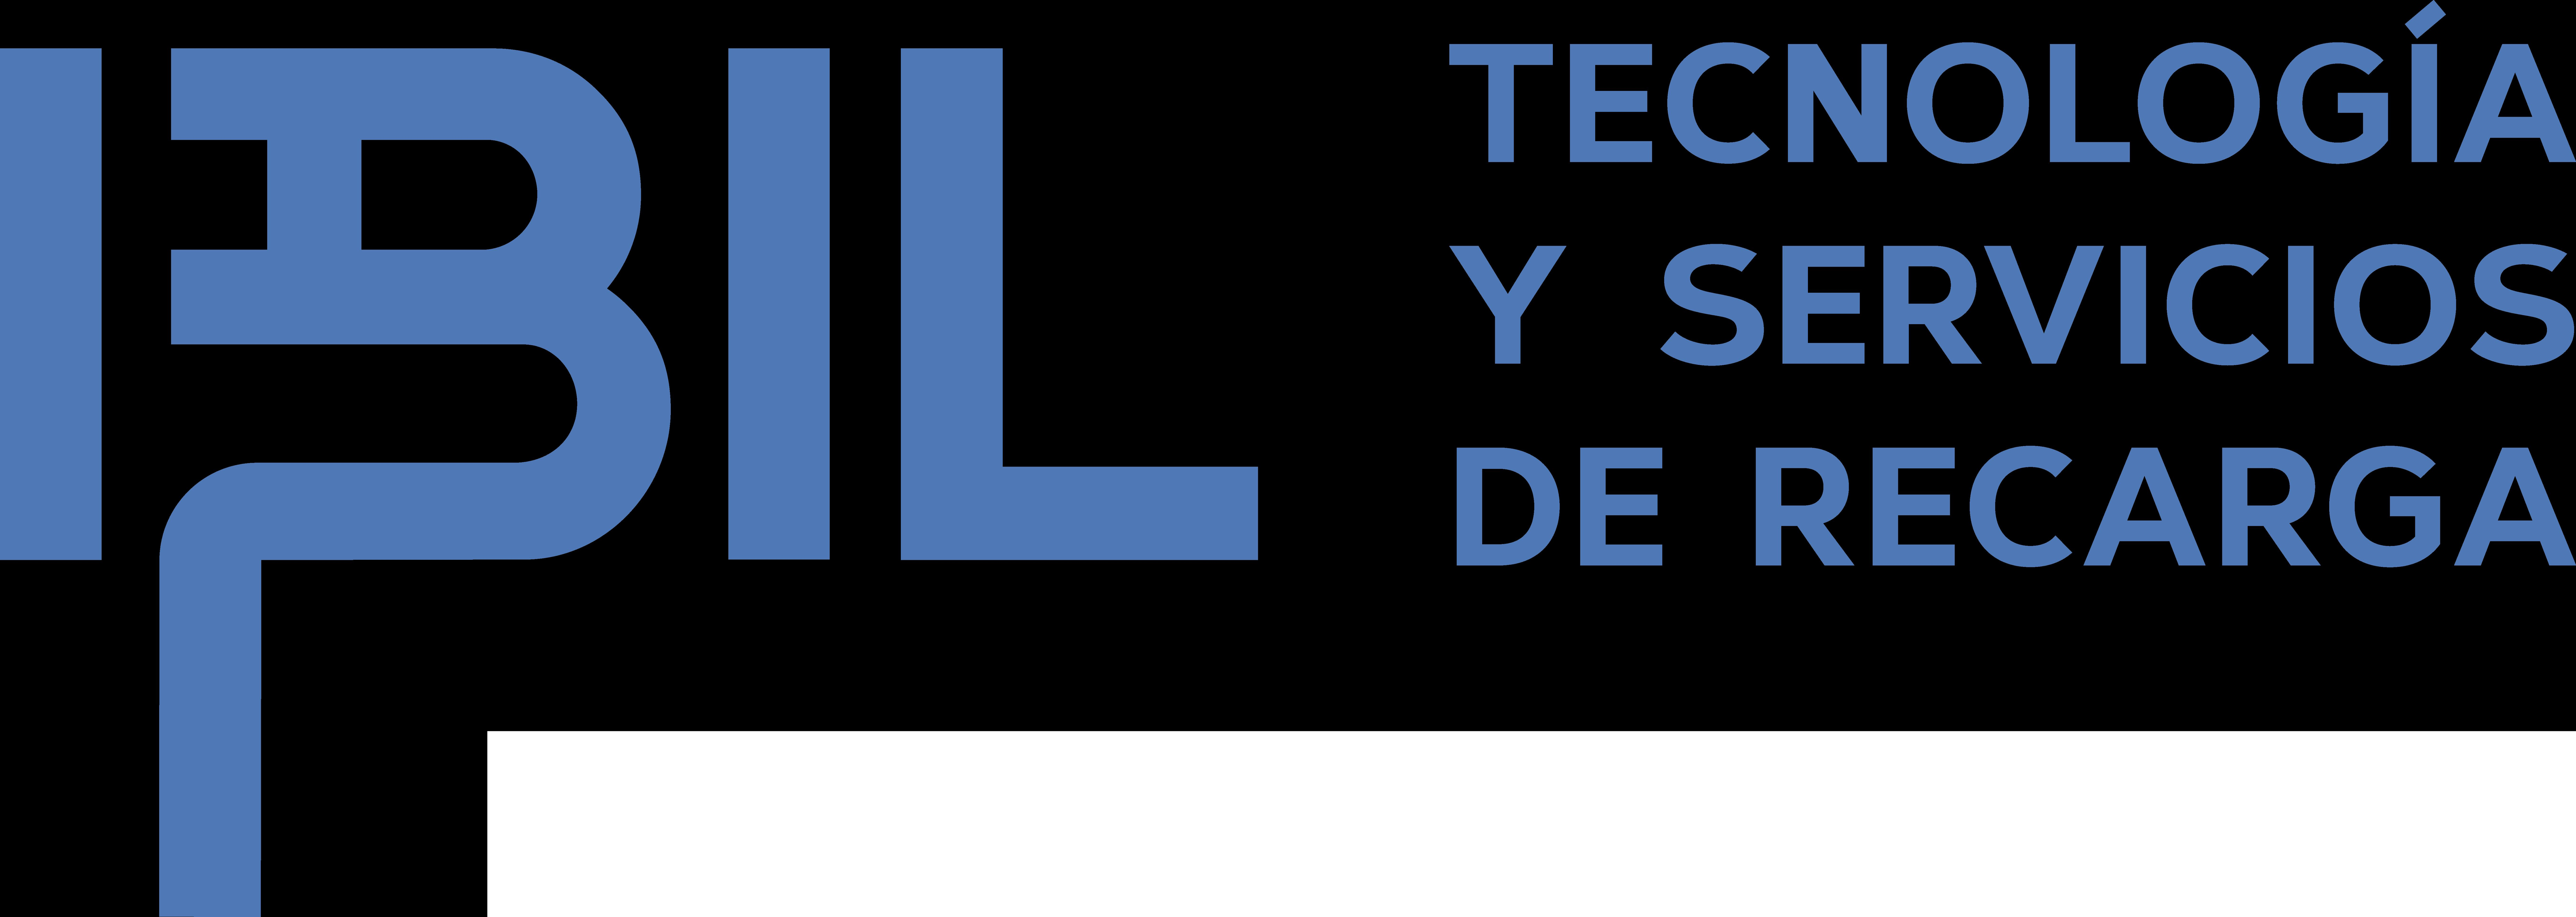 ibil logo